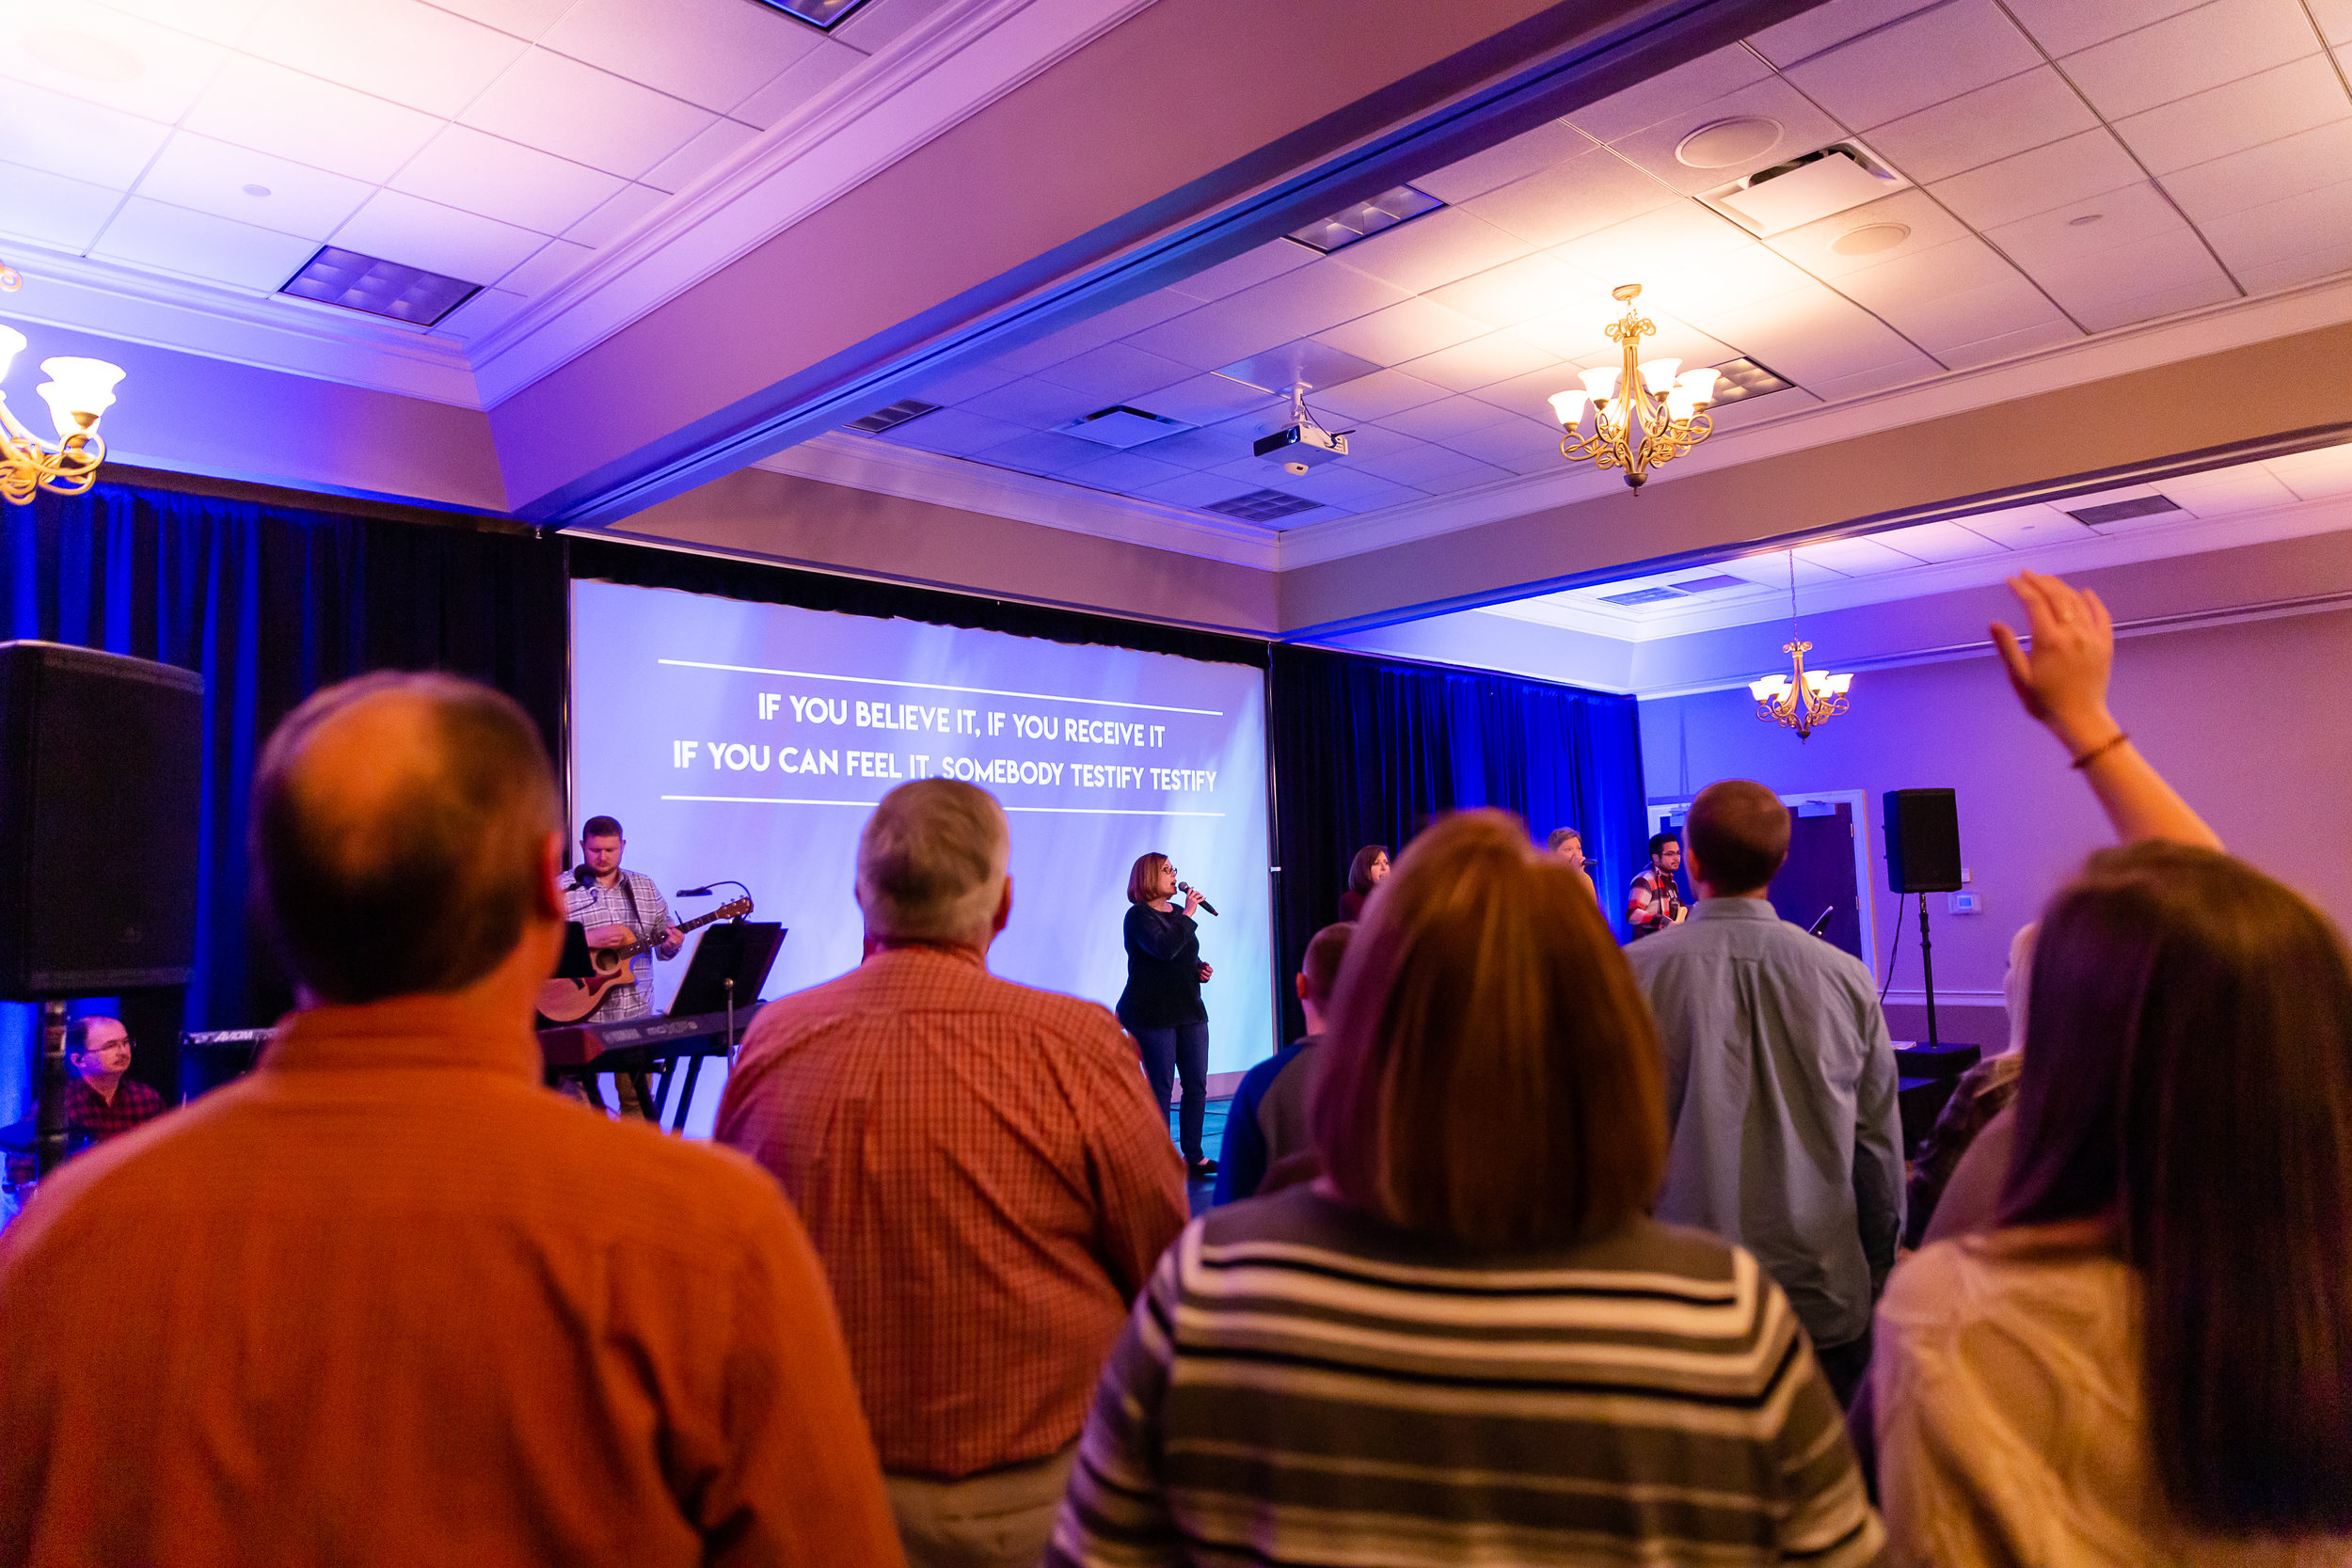 IGNITE Worship - 10:30 AM, Fellowship Hall